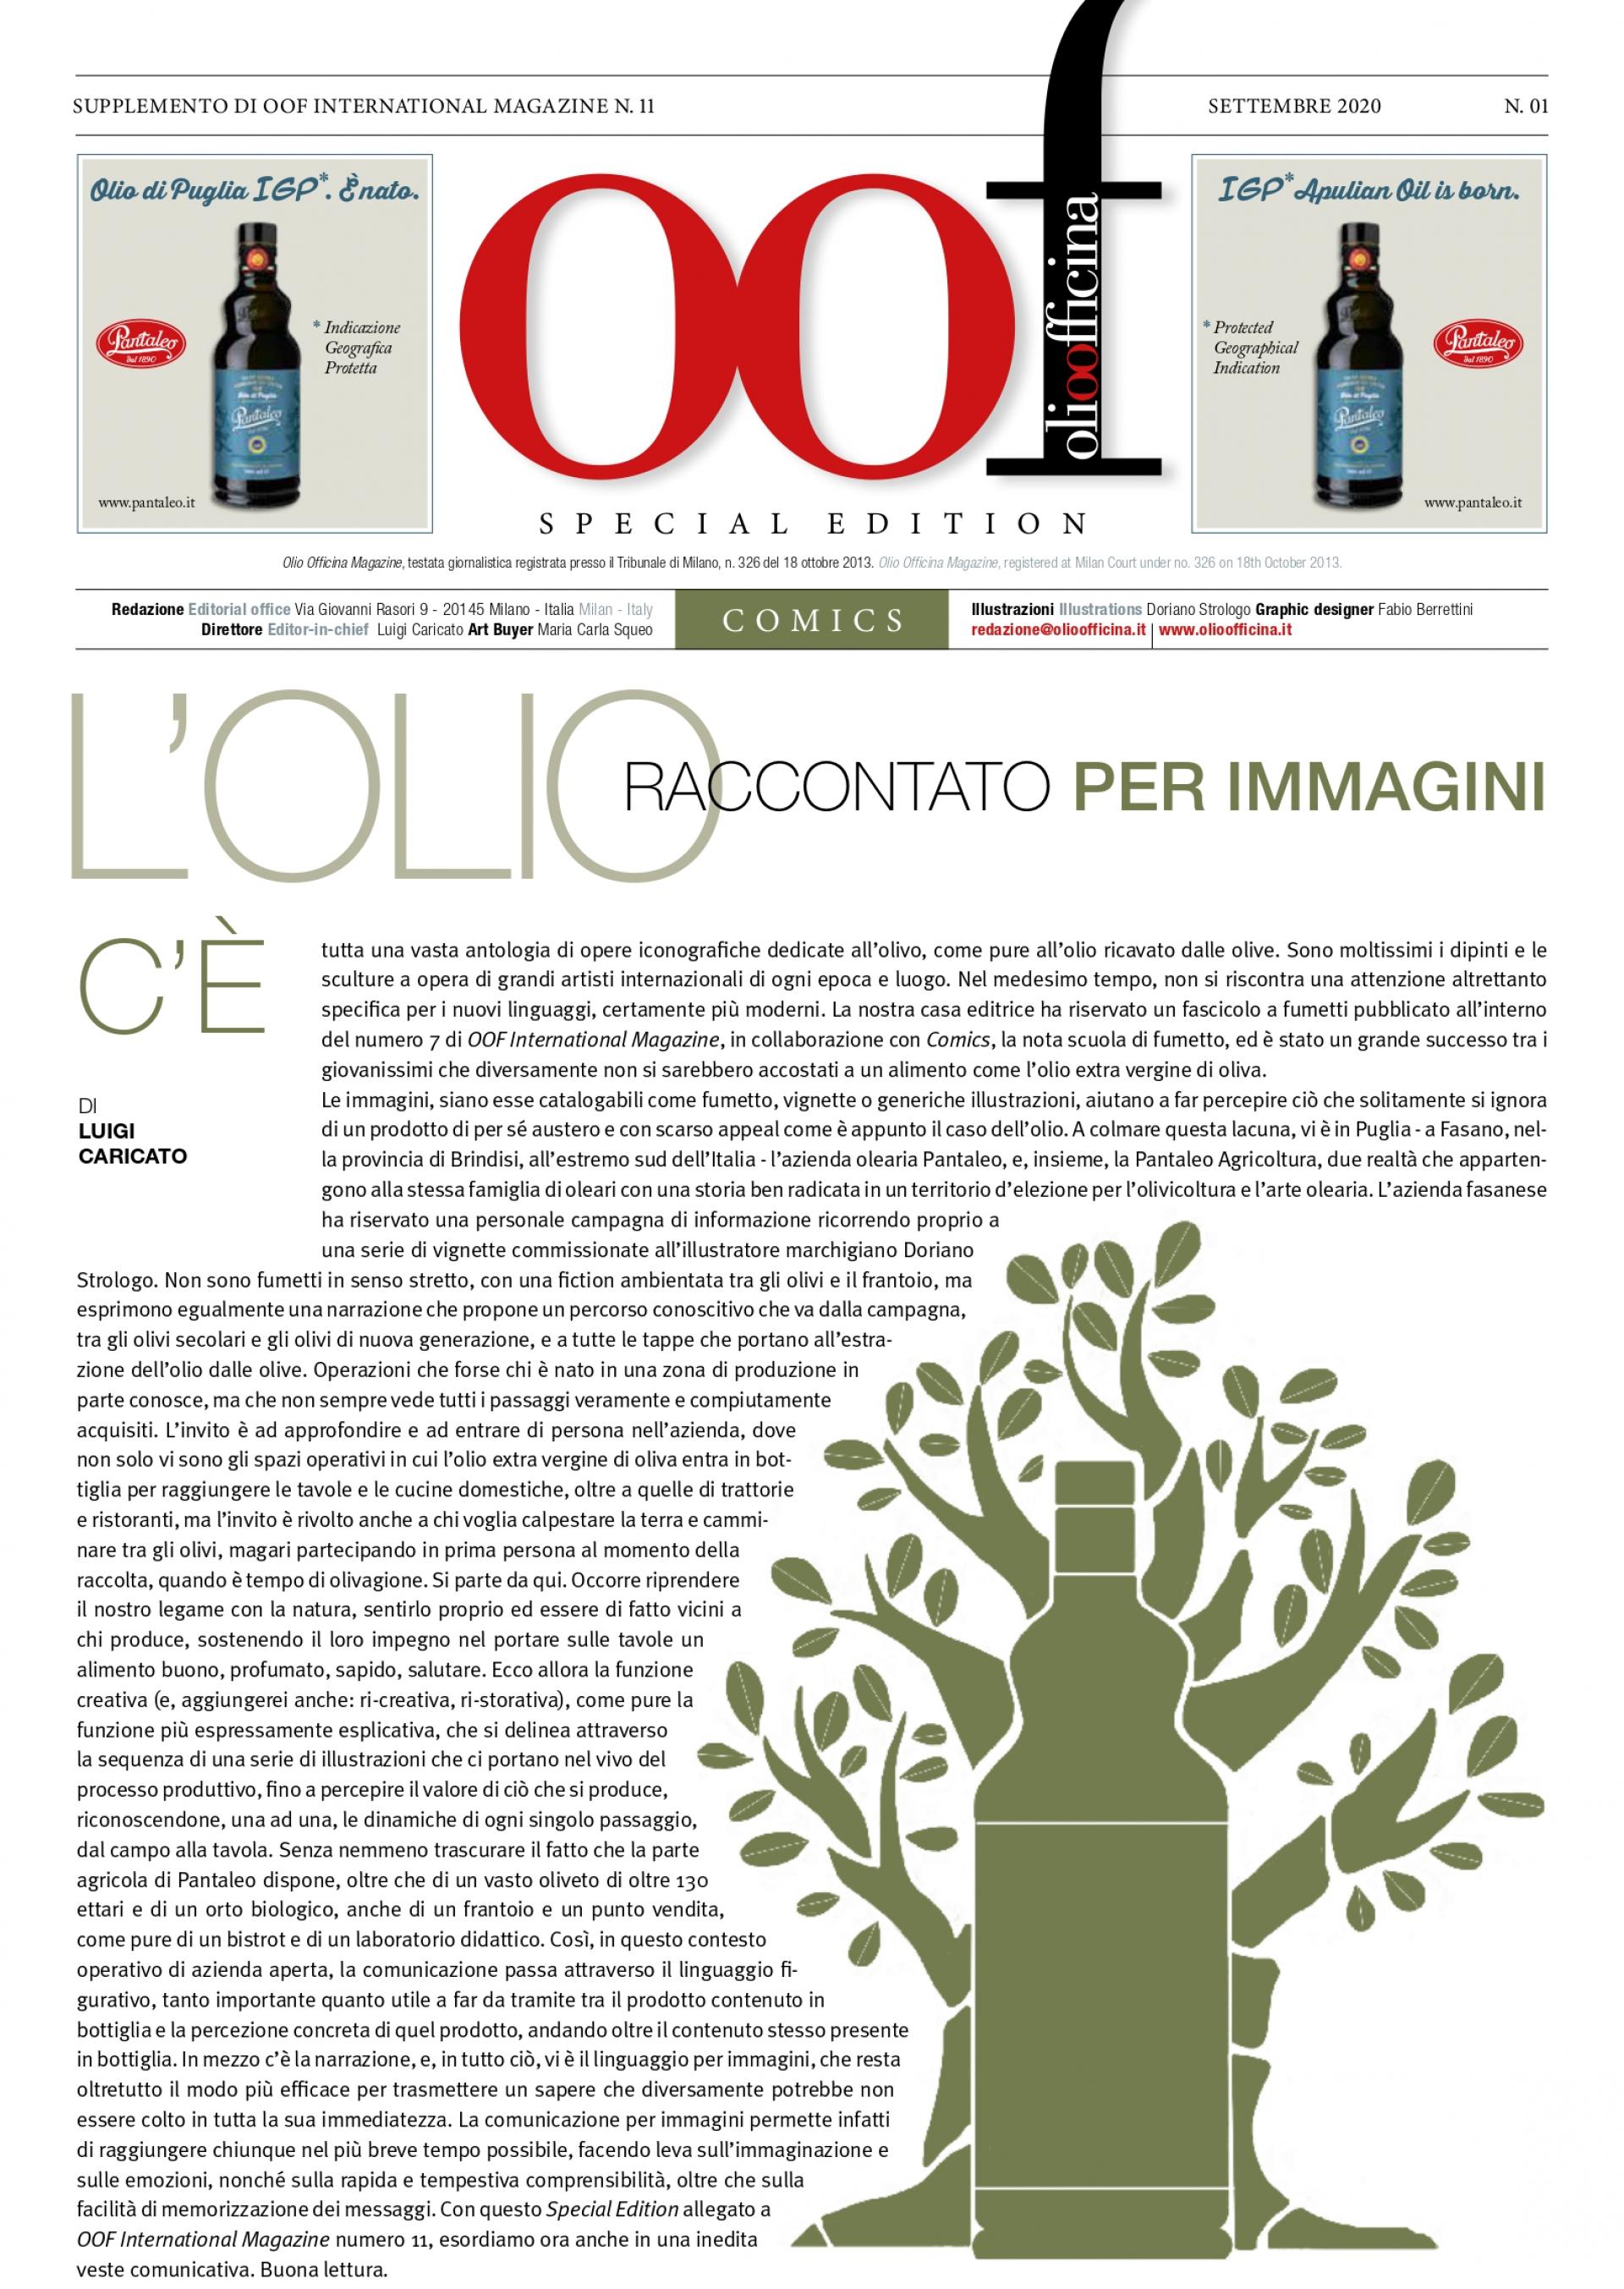 L'OLIO RACCONTATO PER IMMAGINI - OLIVE OIL IN IMAGES Pantaleo | Special edition | Comics